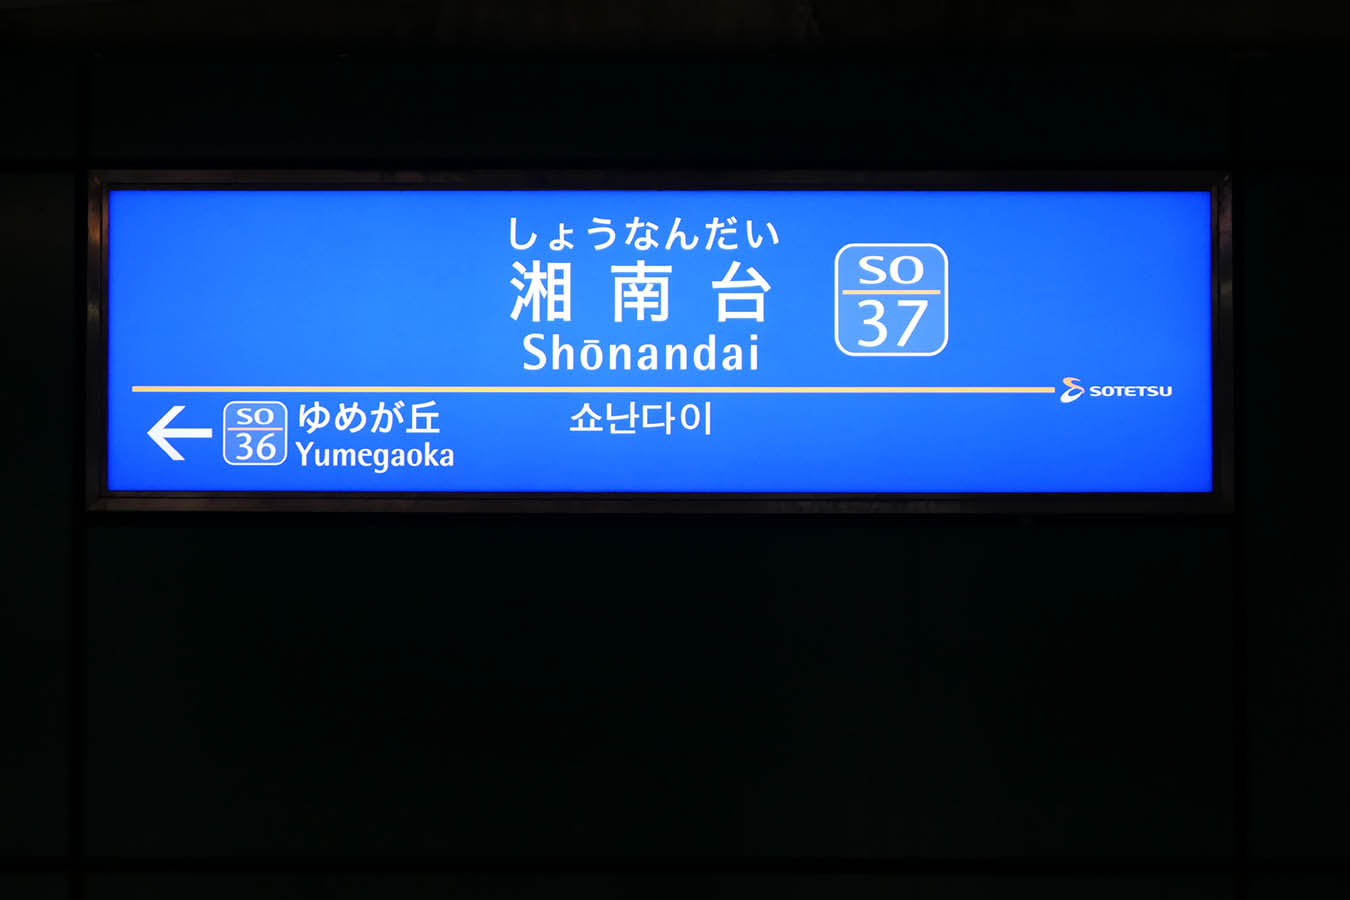 SO37_photo06.jpg